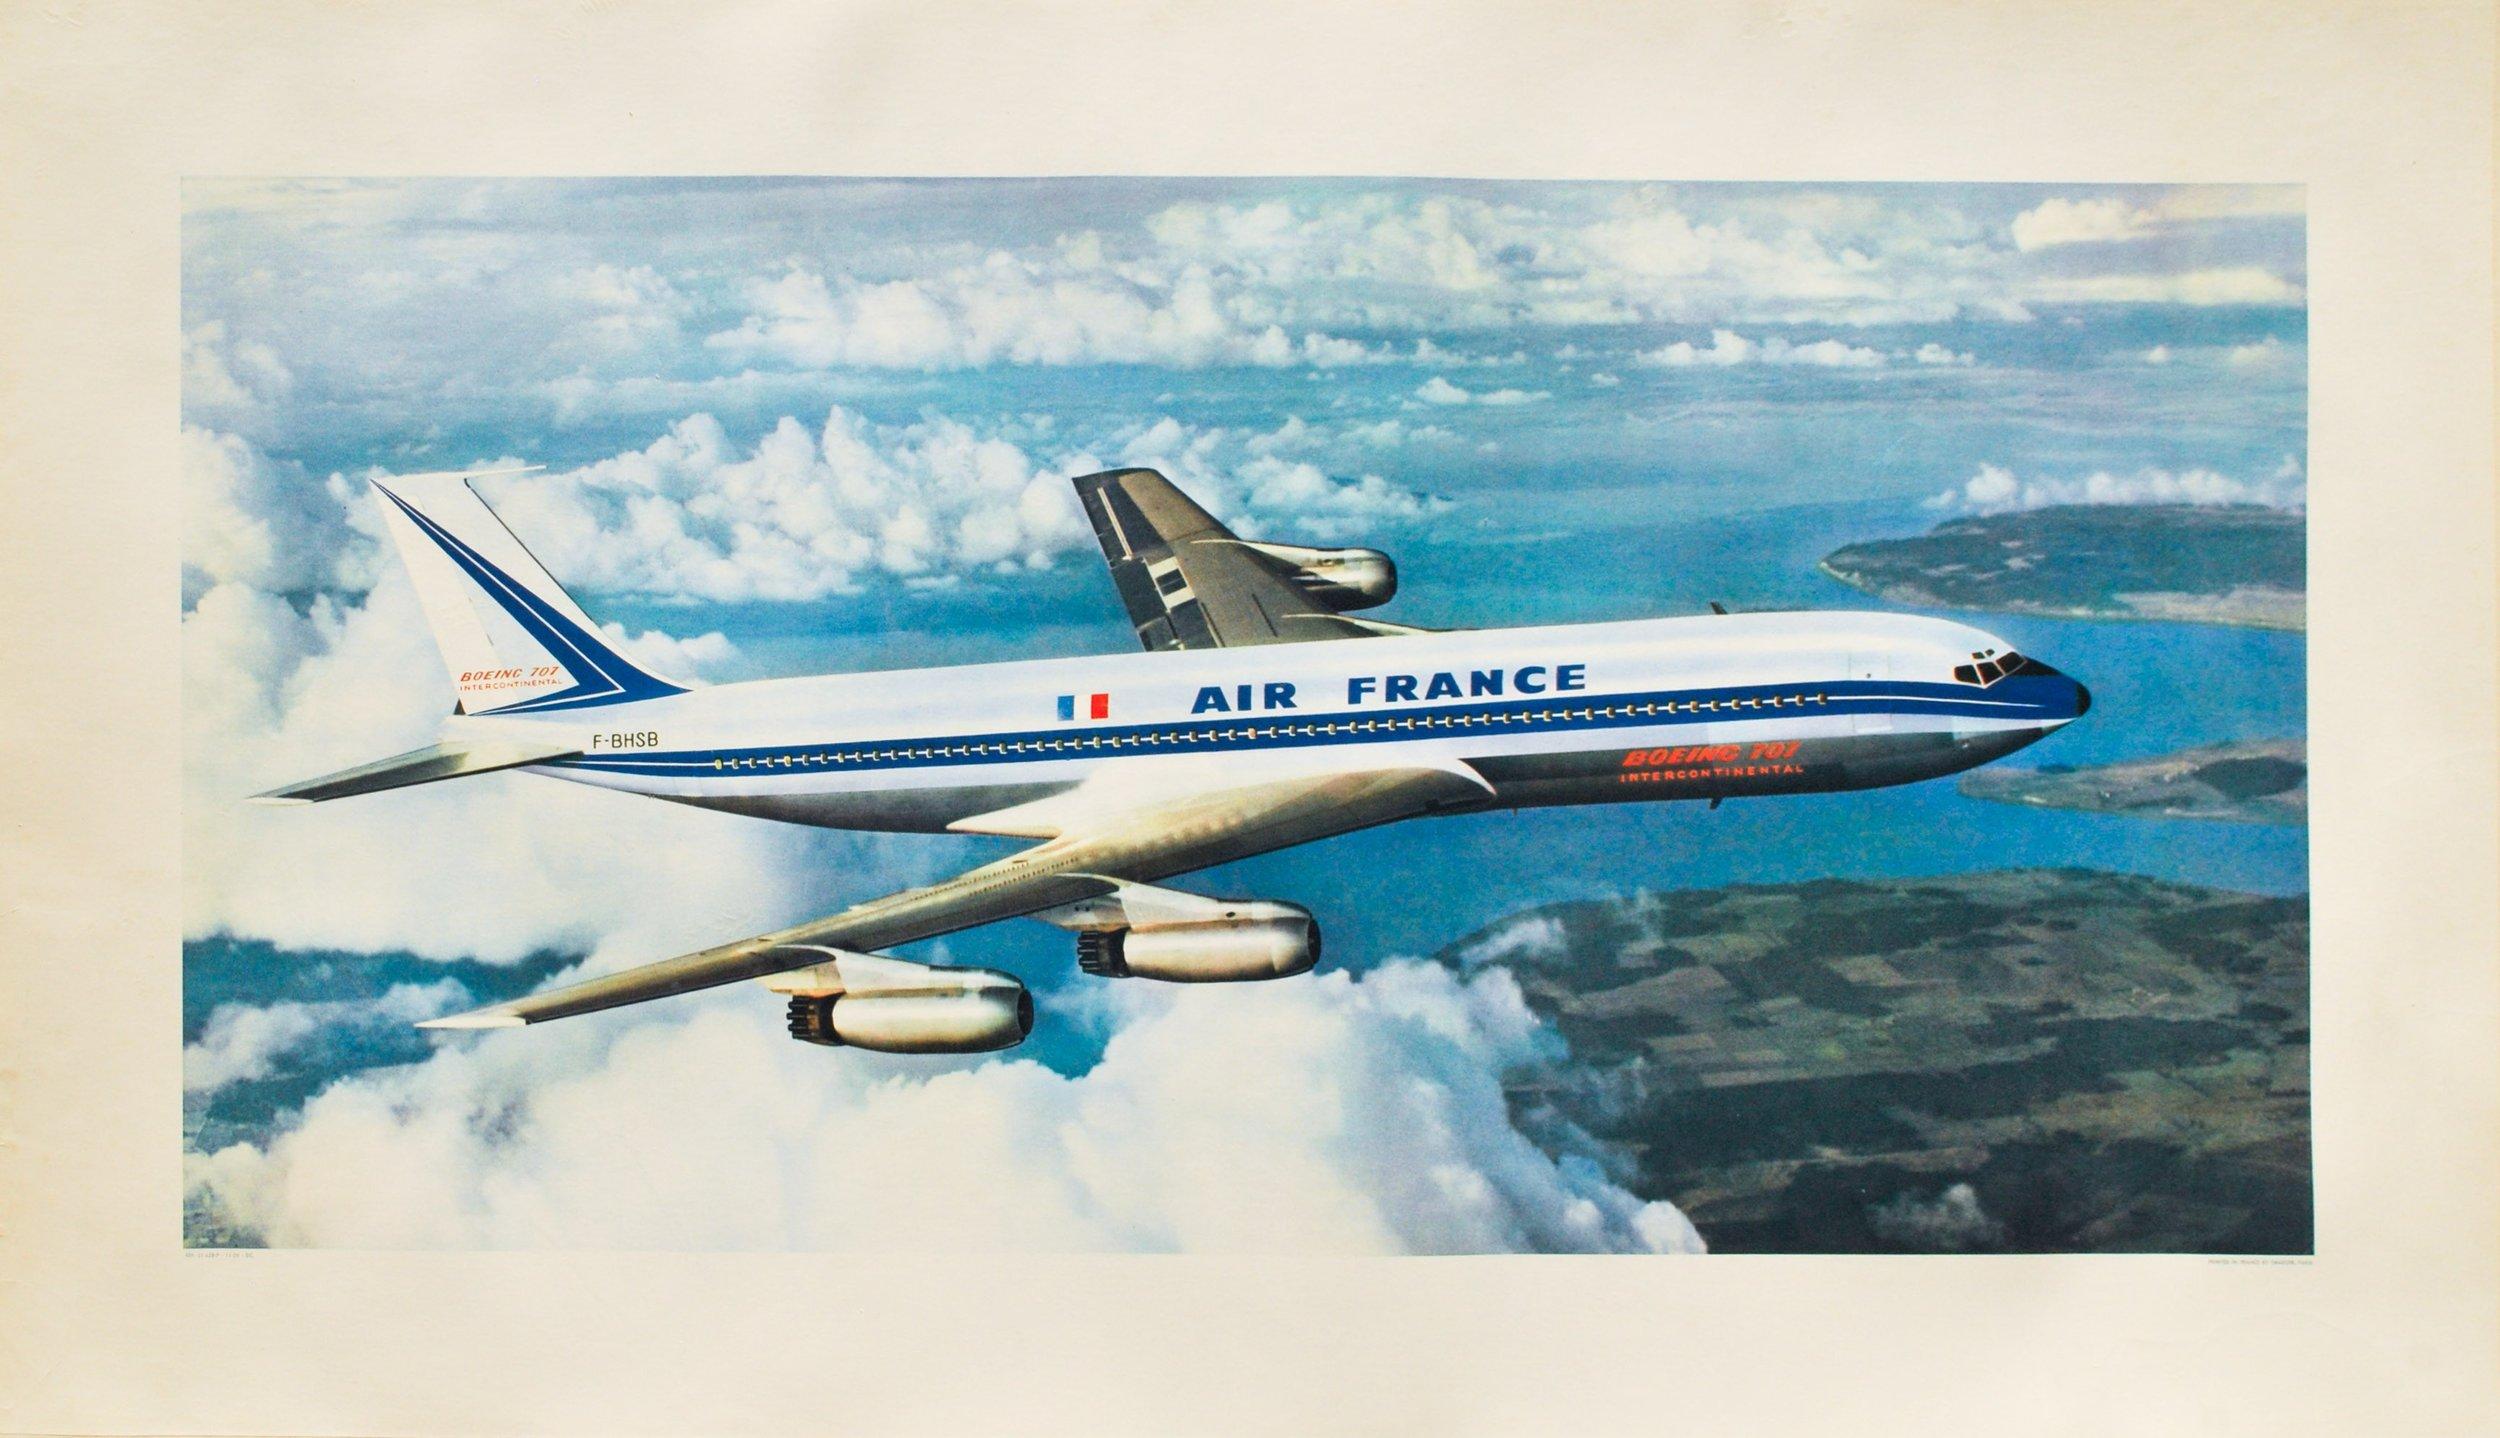 Vintage Airline travel posters Vintage cookbooks00030.jpg